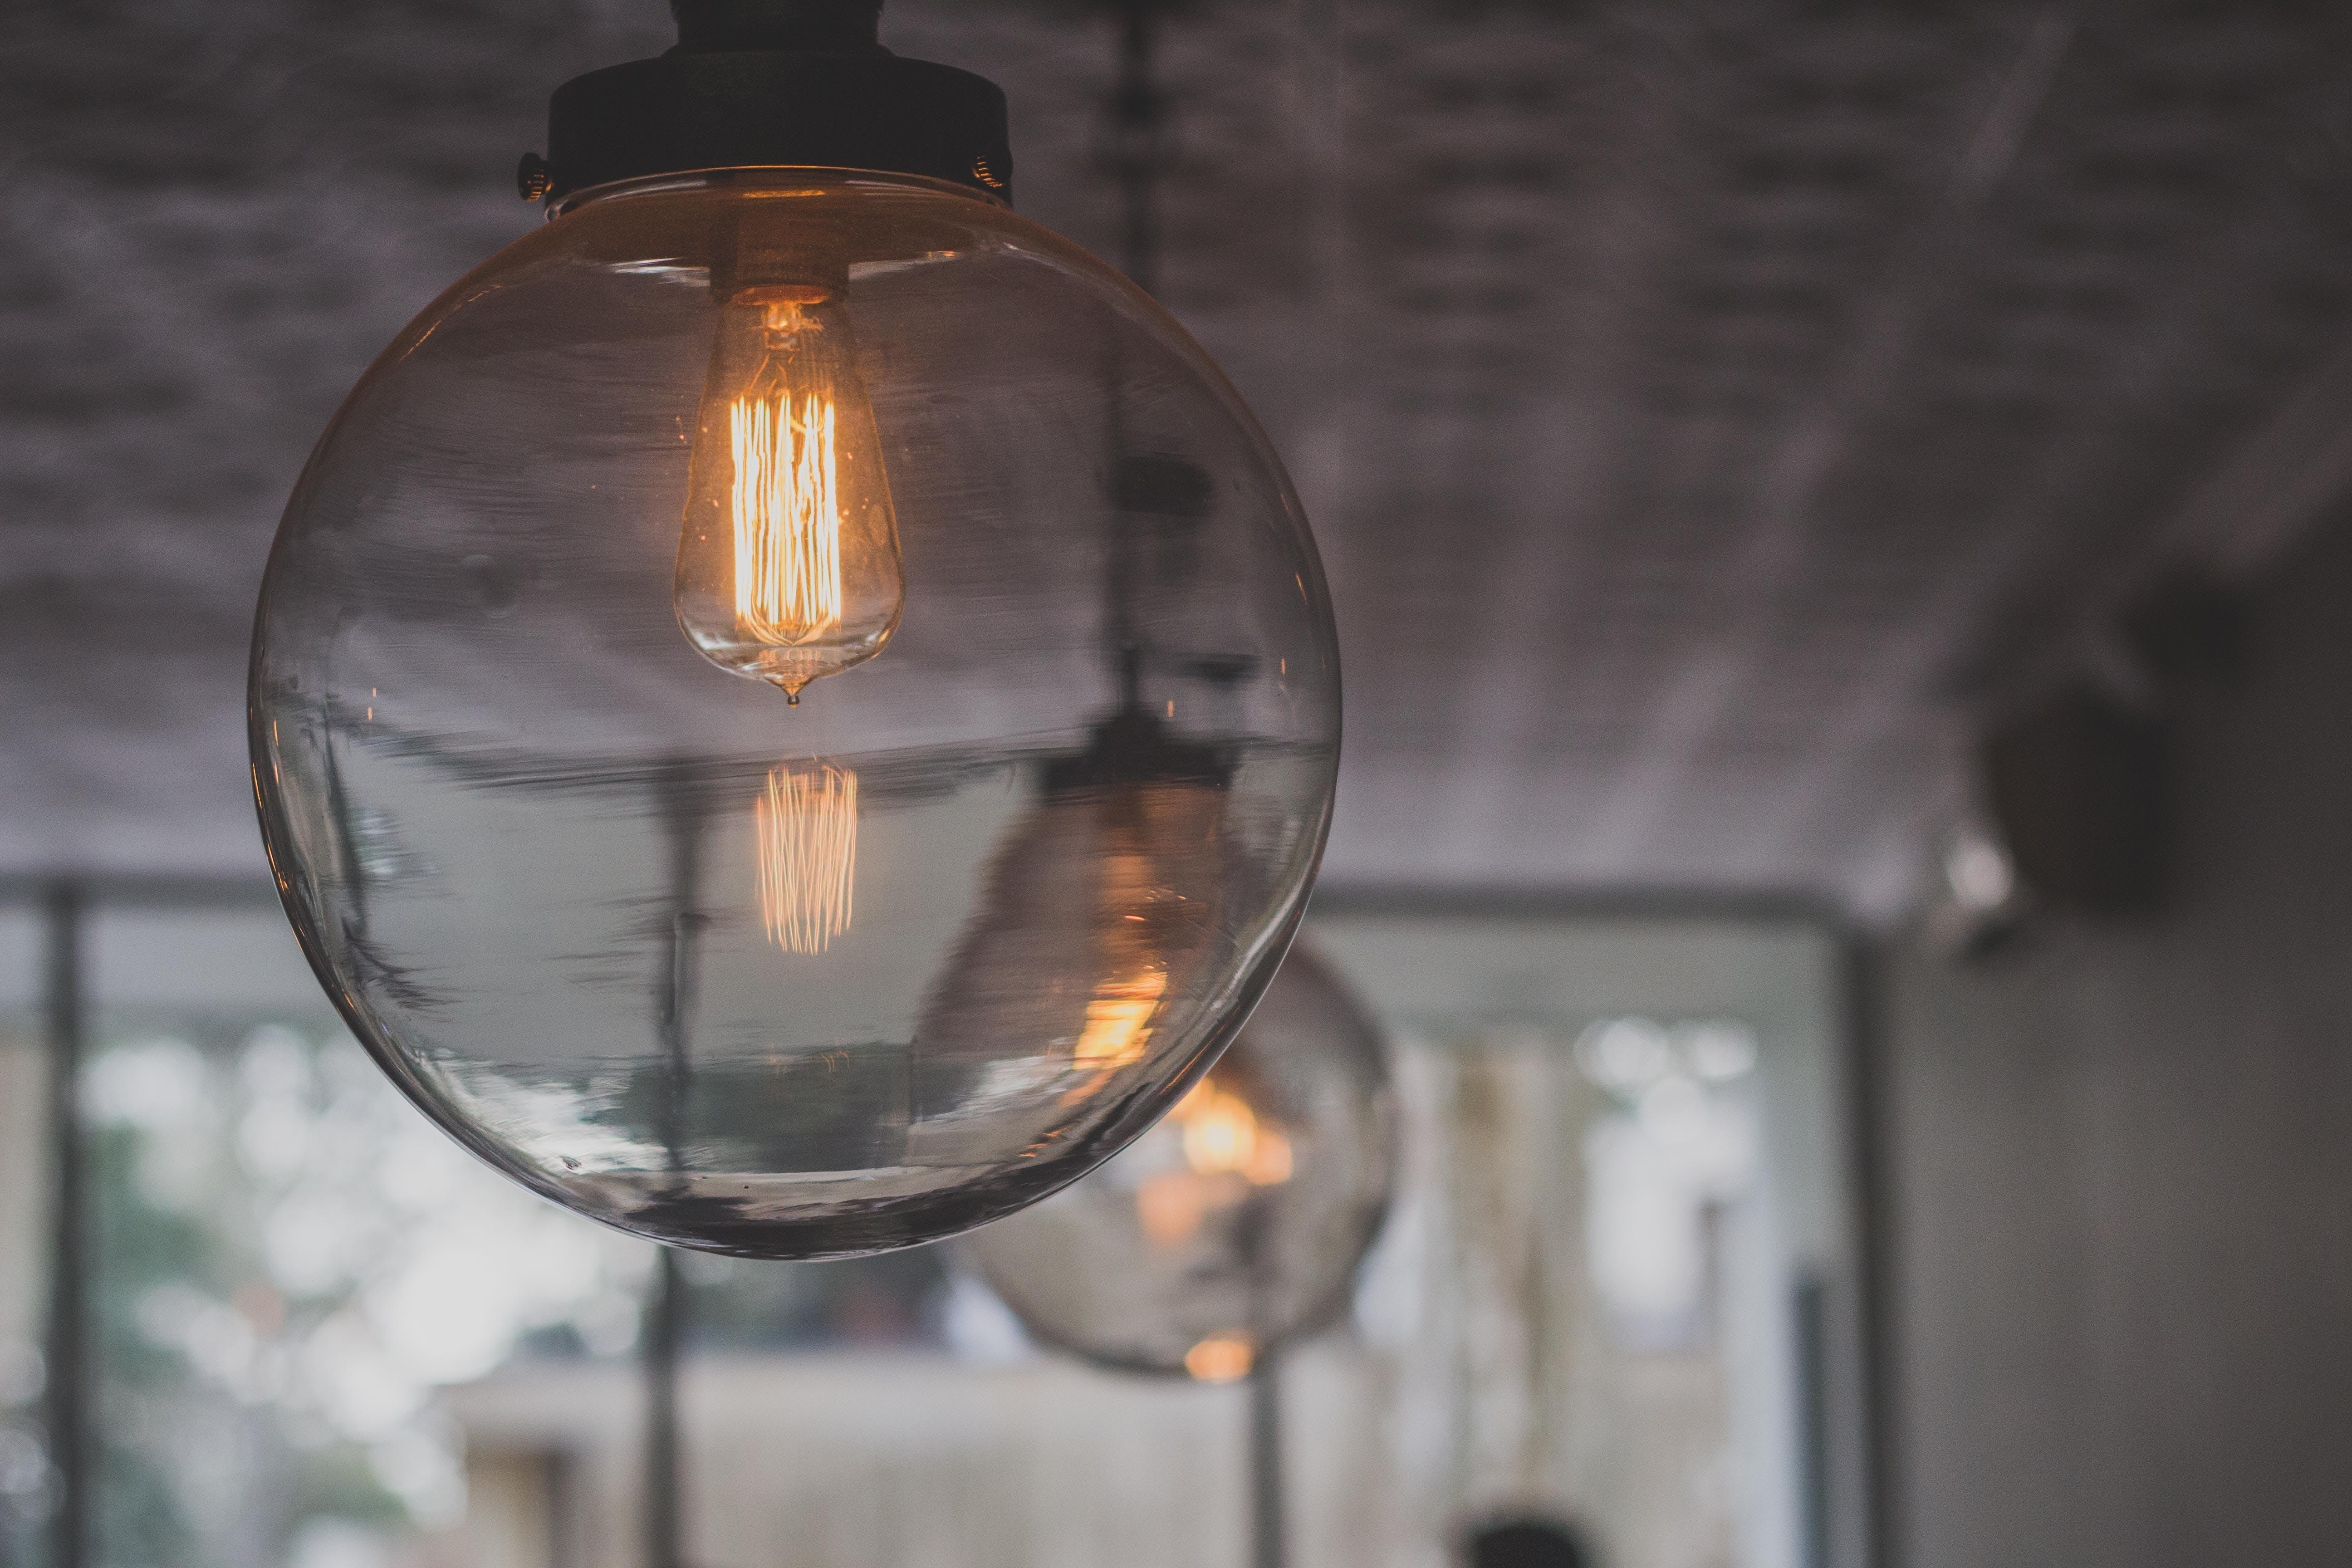 Clear Round Glass Bulbs Inside Room